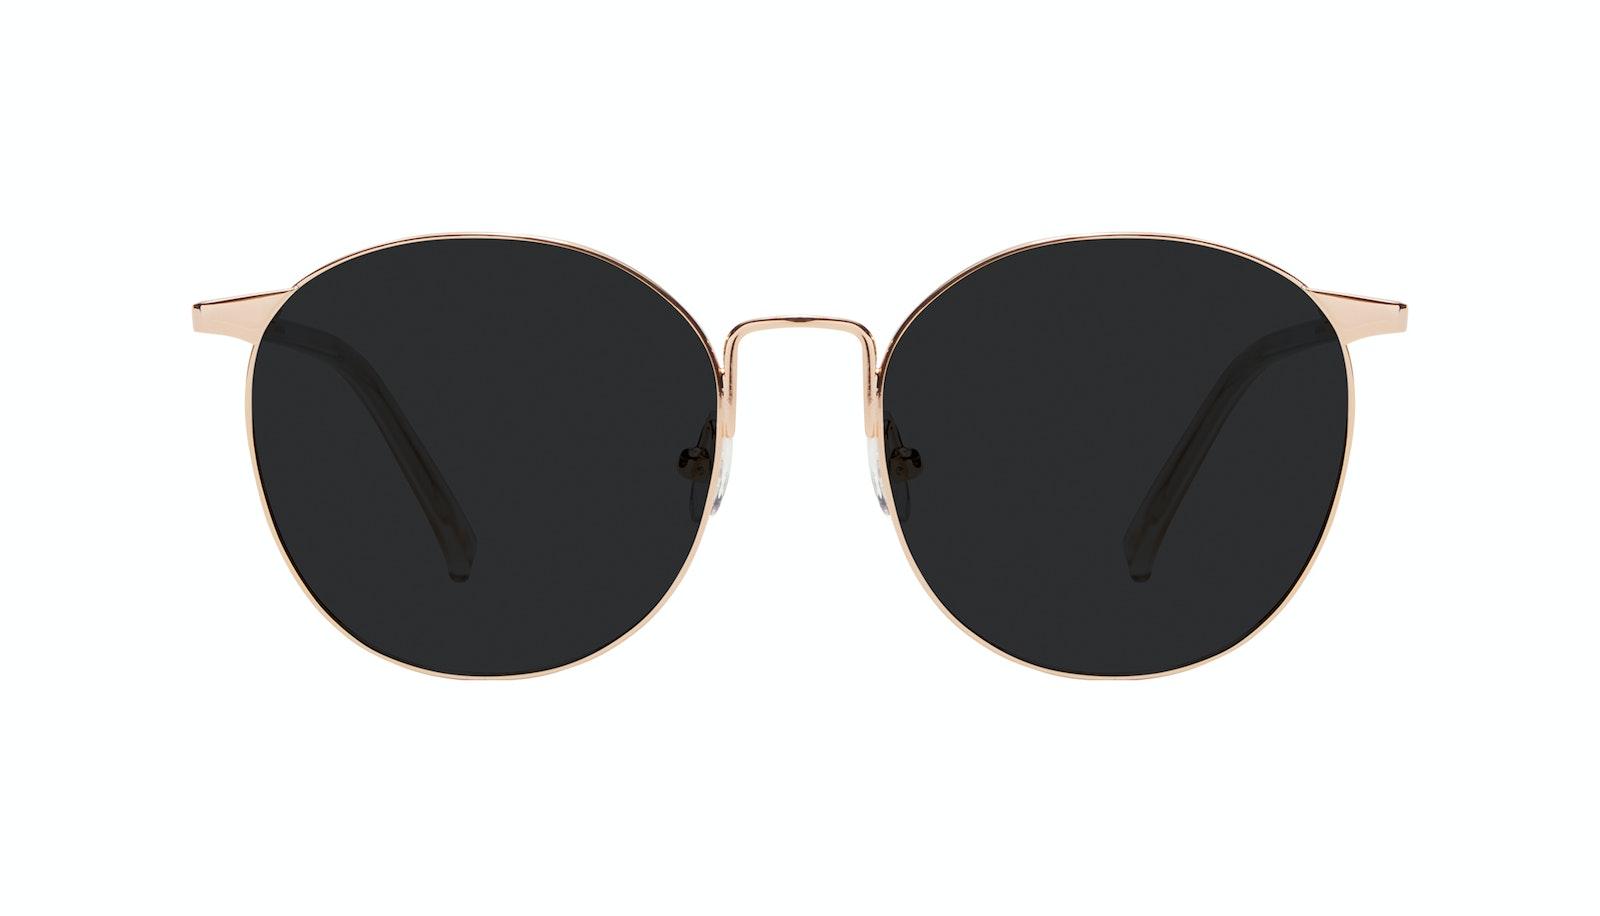 Affordable Fashion Glasses Round Sunglasses Women Romy Aurore